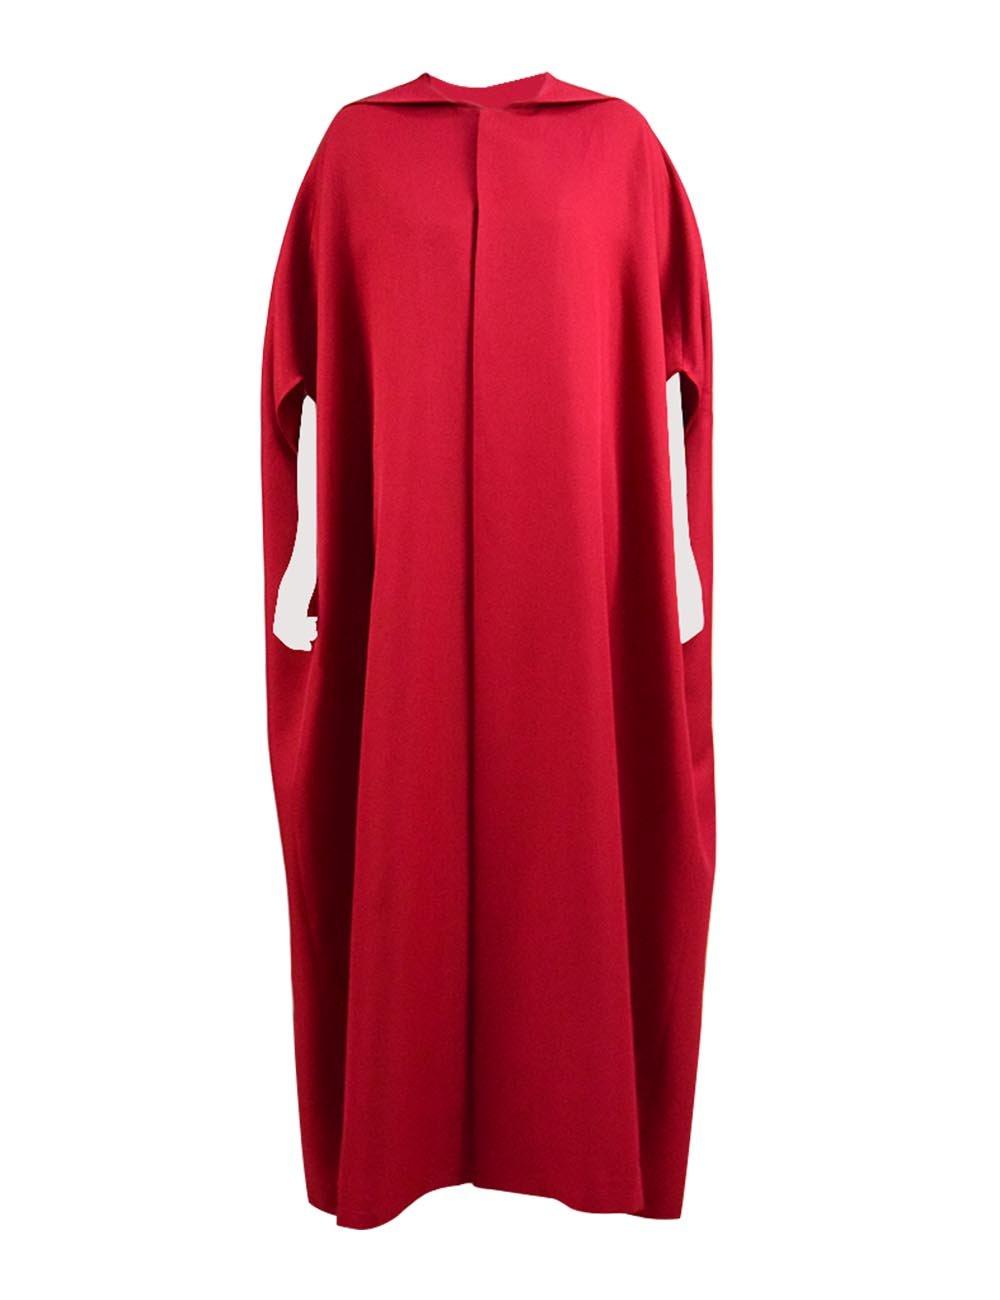 Expeke Halloween Party Women Handmaid Red Cape Dress Costume (XL, Cape)